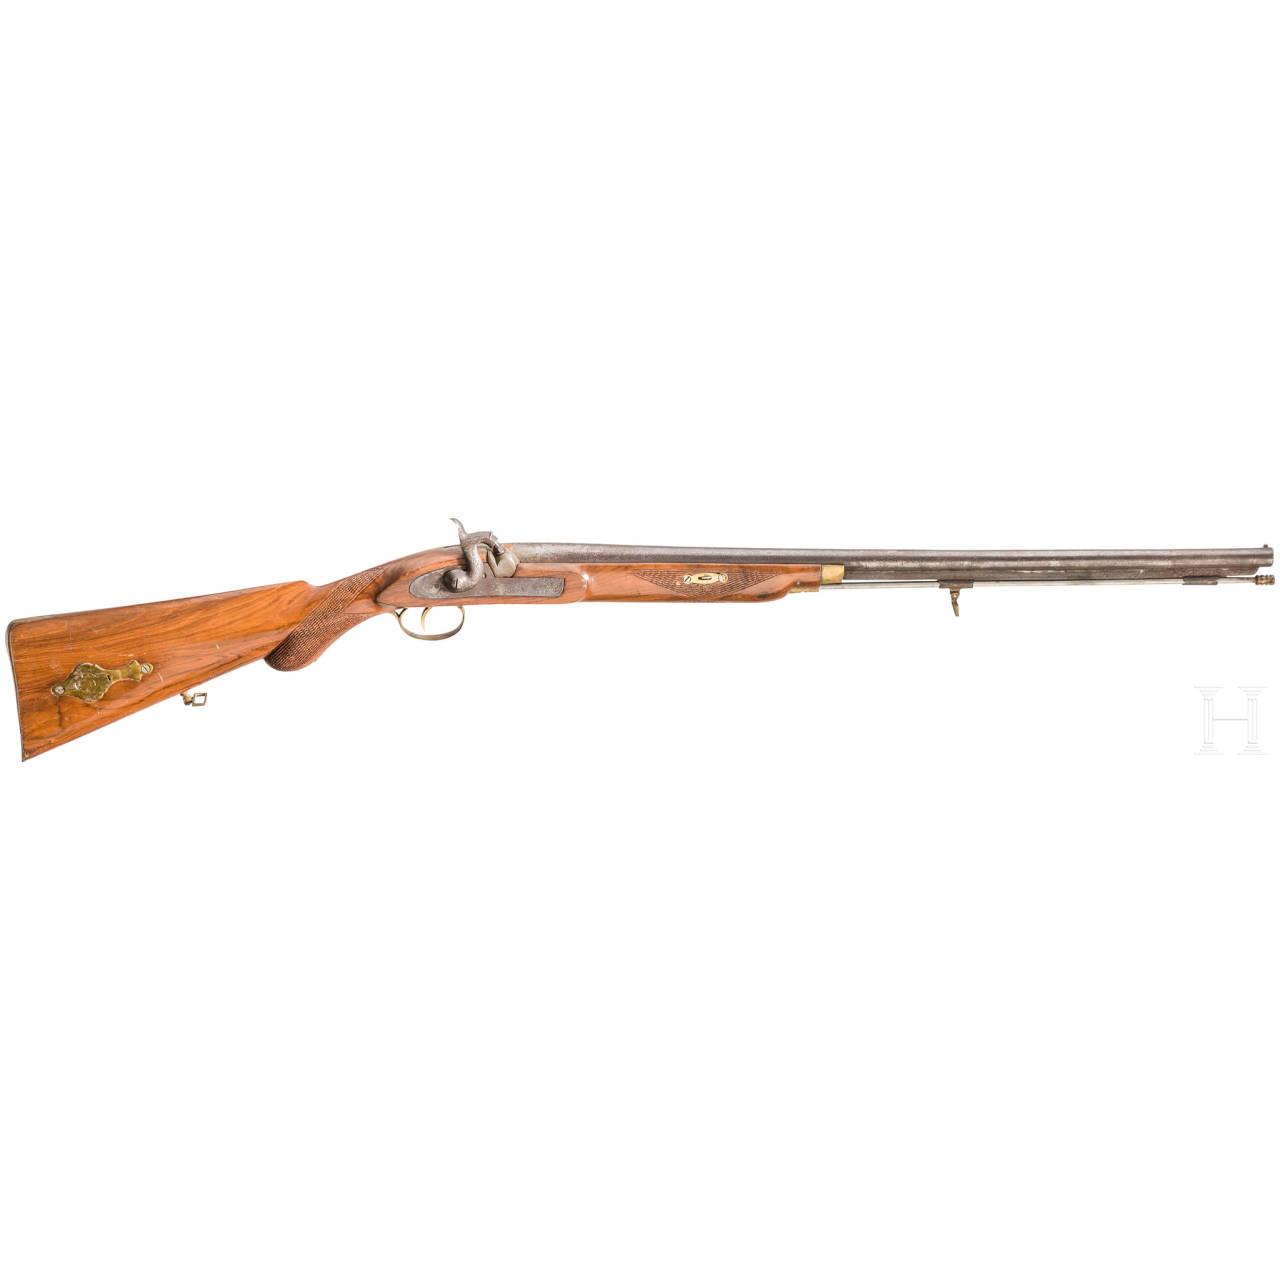 Perkussionsgewehr, Replik im Stil um 1850